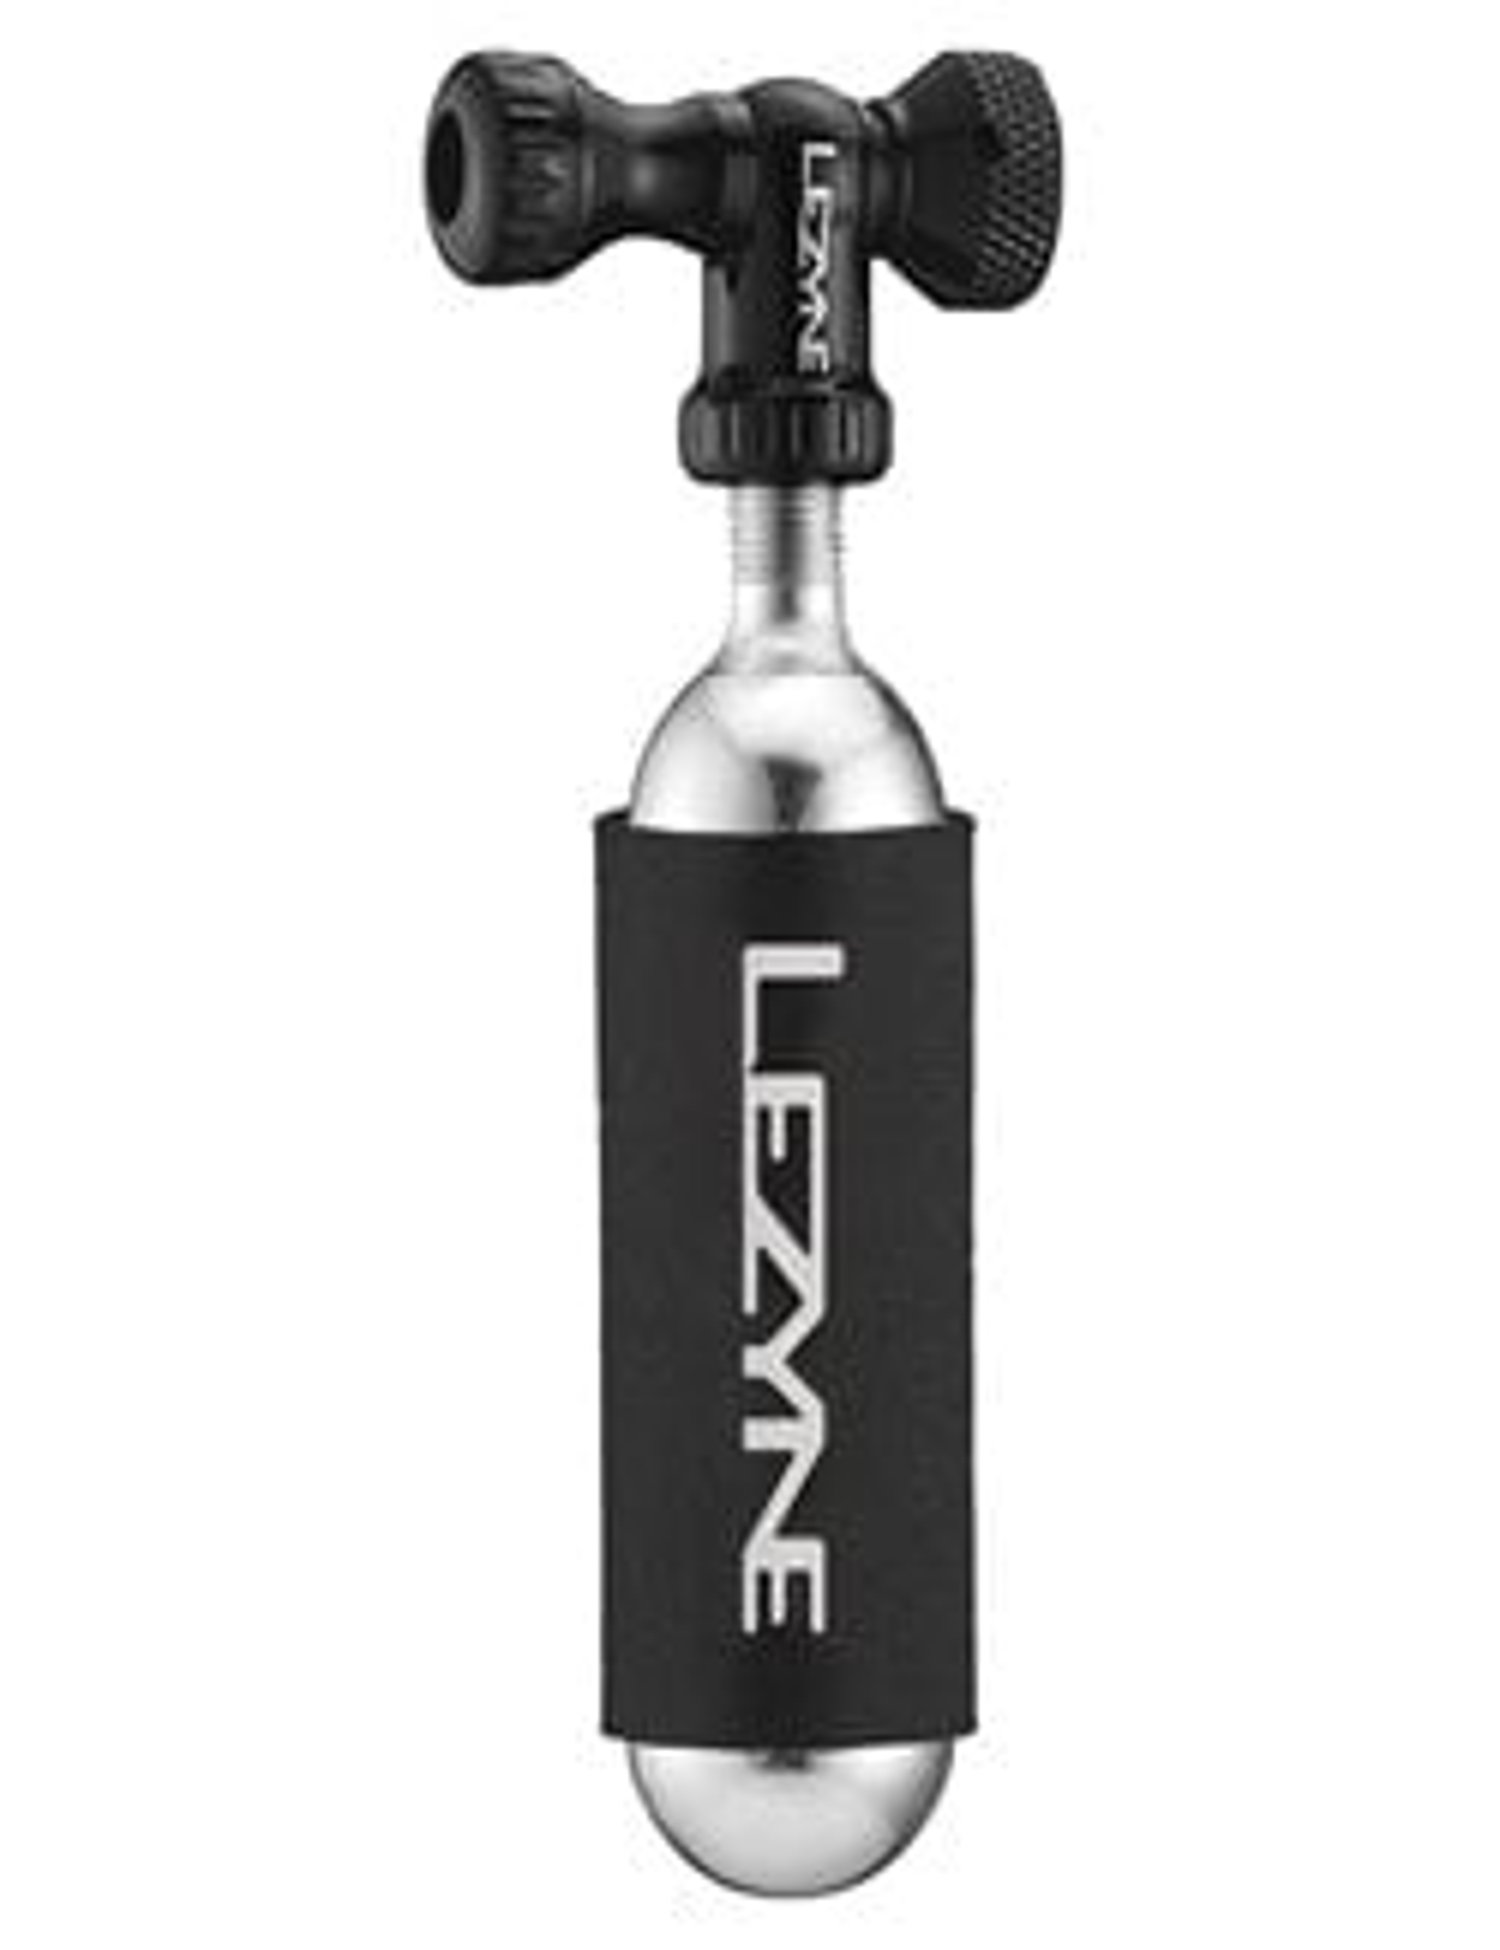 Lezyne | Control Drive Co2 Pump | Black | 25G